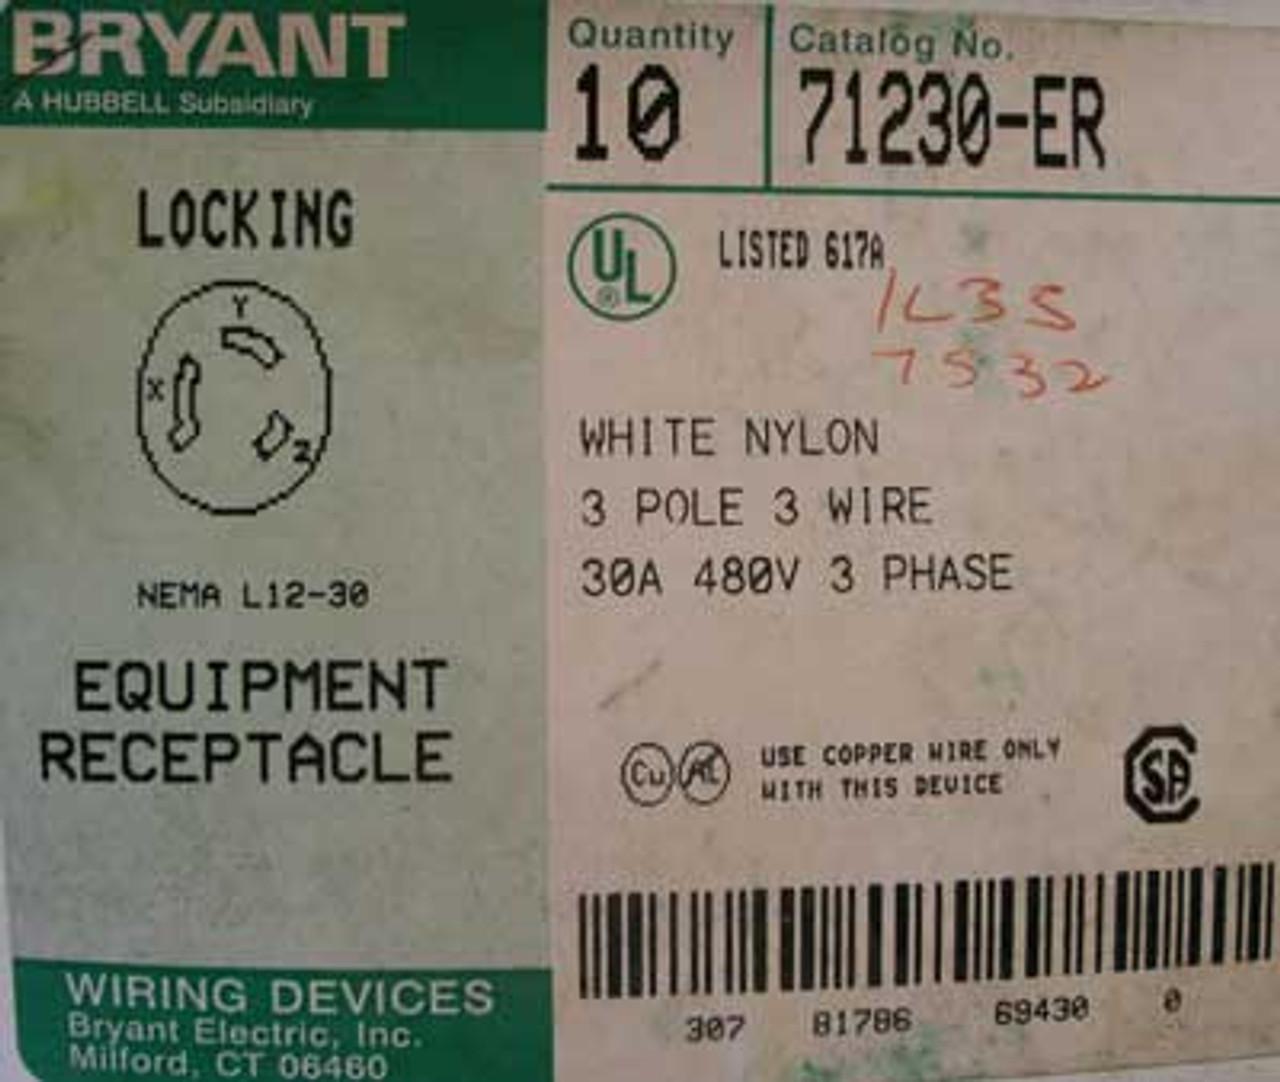 Bryant 71230-ER Locking Nema L12-30 Equipment Receptacle - New